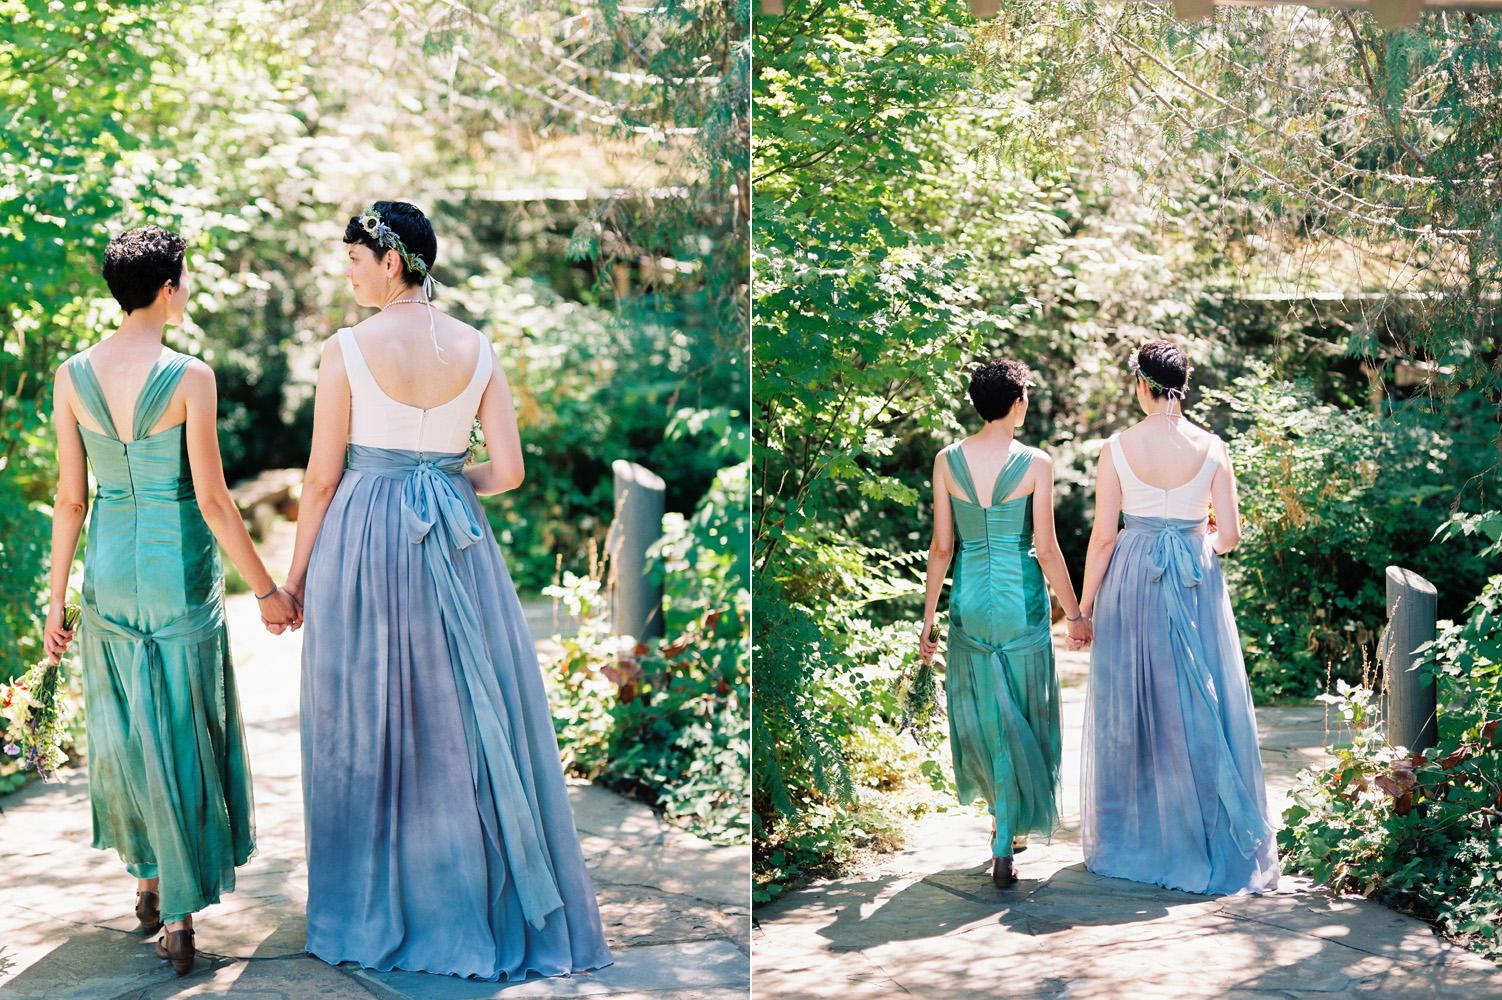 Pacific Northwest Same Sex Wedding near Rattlesnake Lake